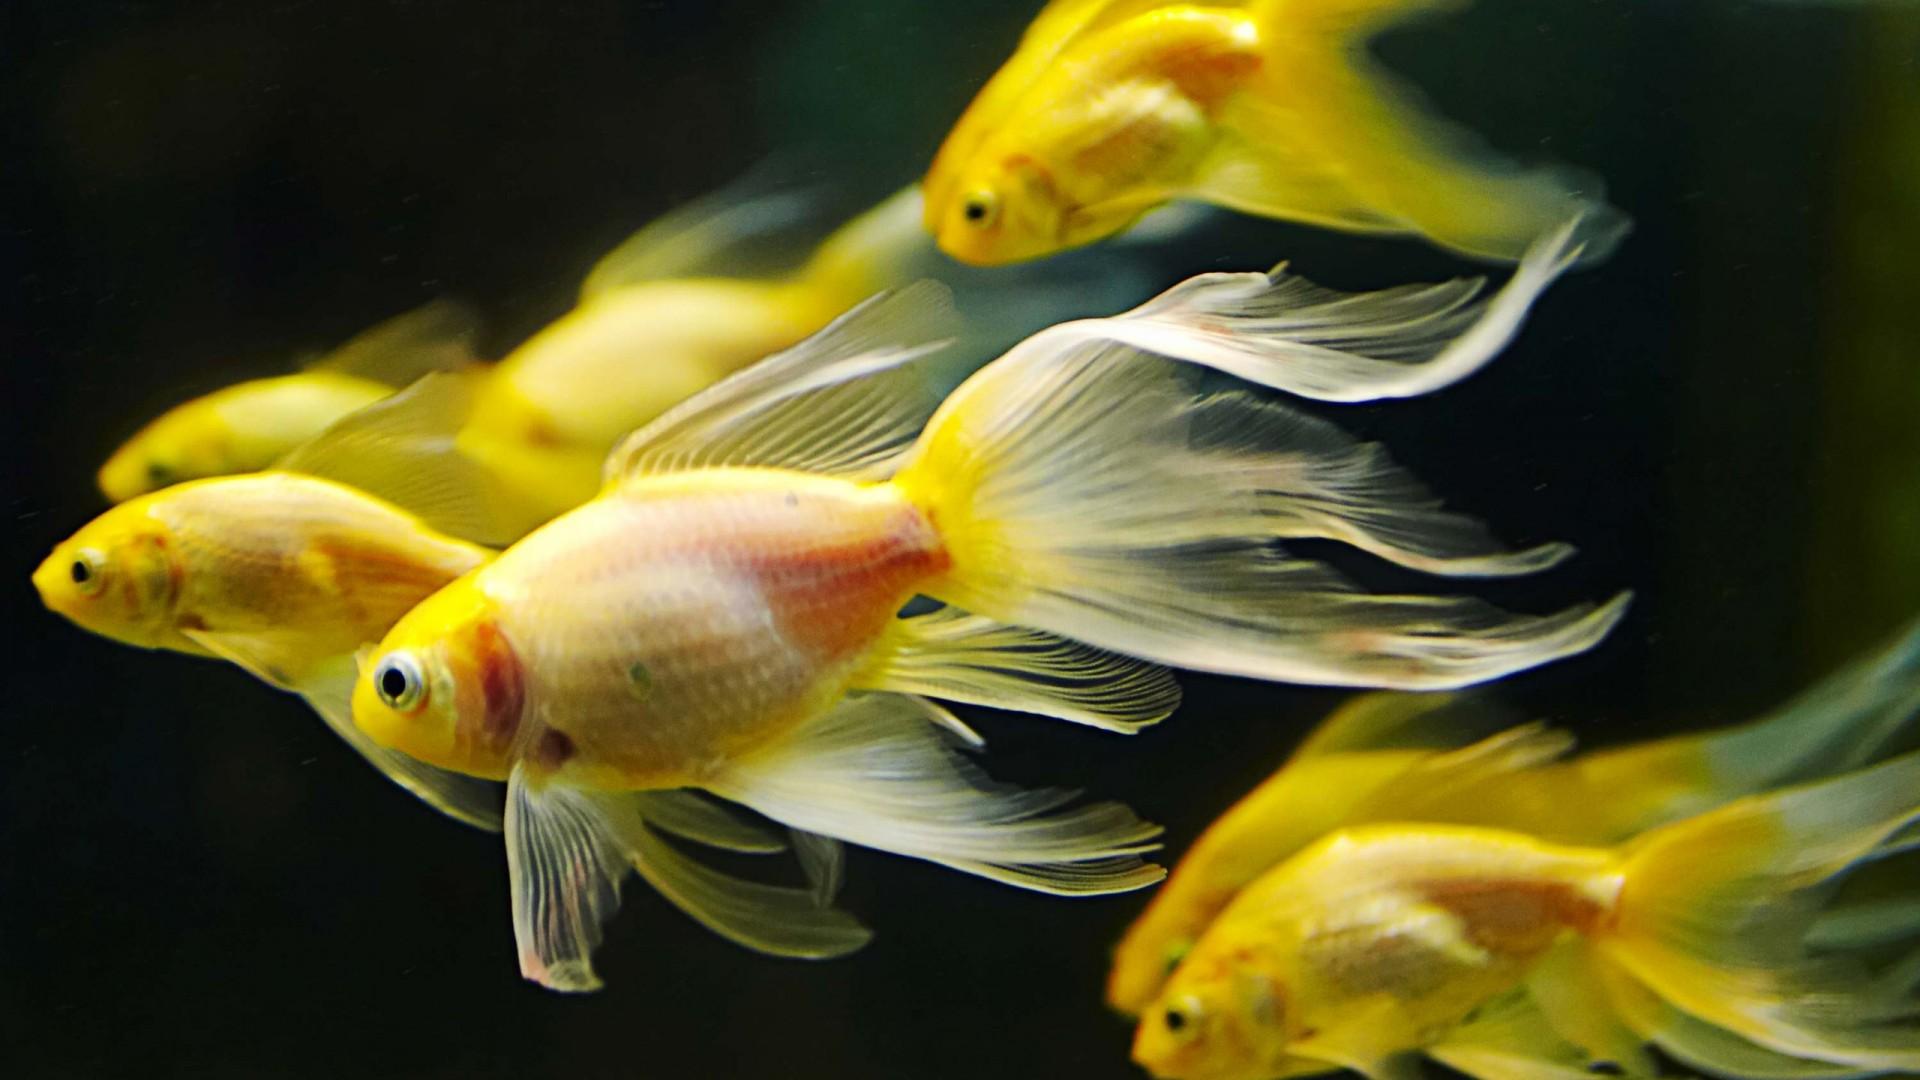 Yellow Goldfish Animal Wallpaper 630 1920x1080 1080p